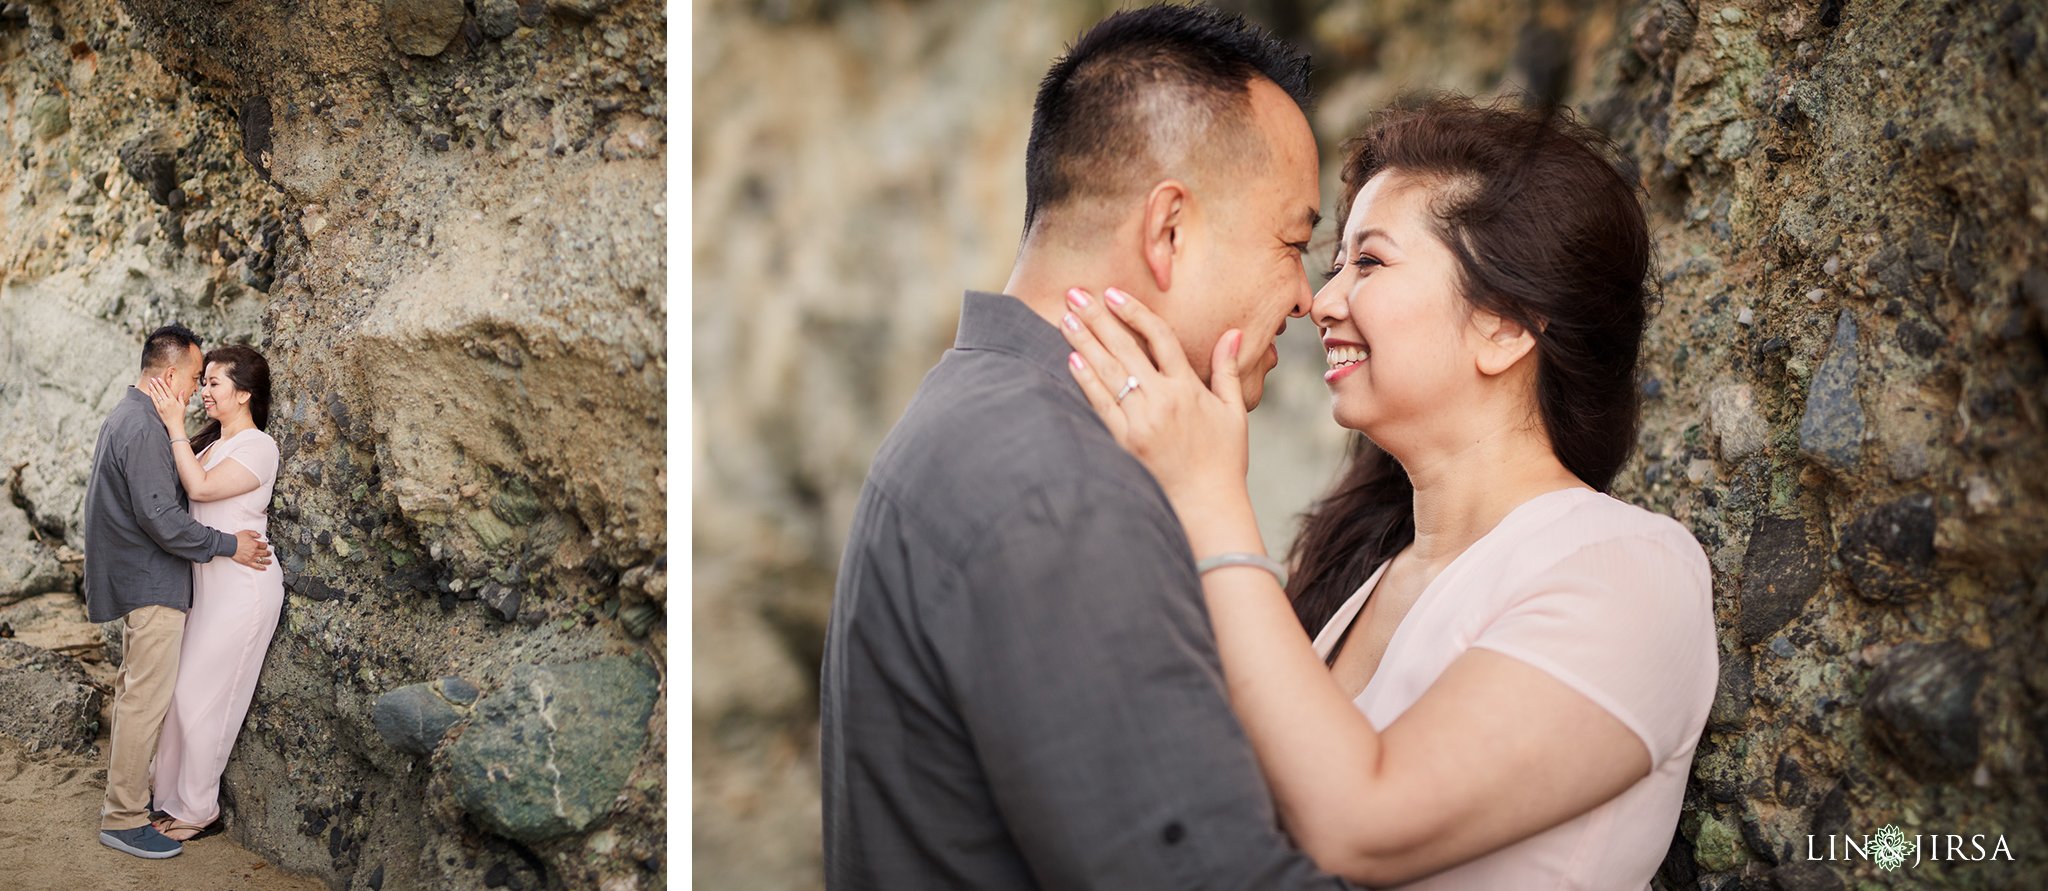 06 Treasure Island Laguna Beach Engagement Photography